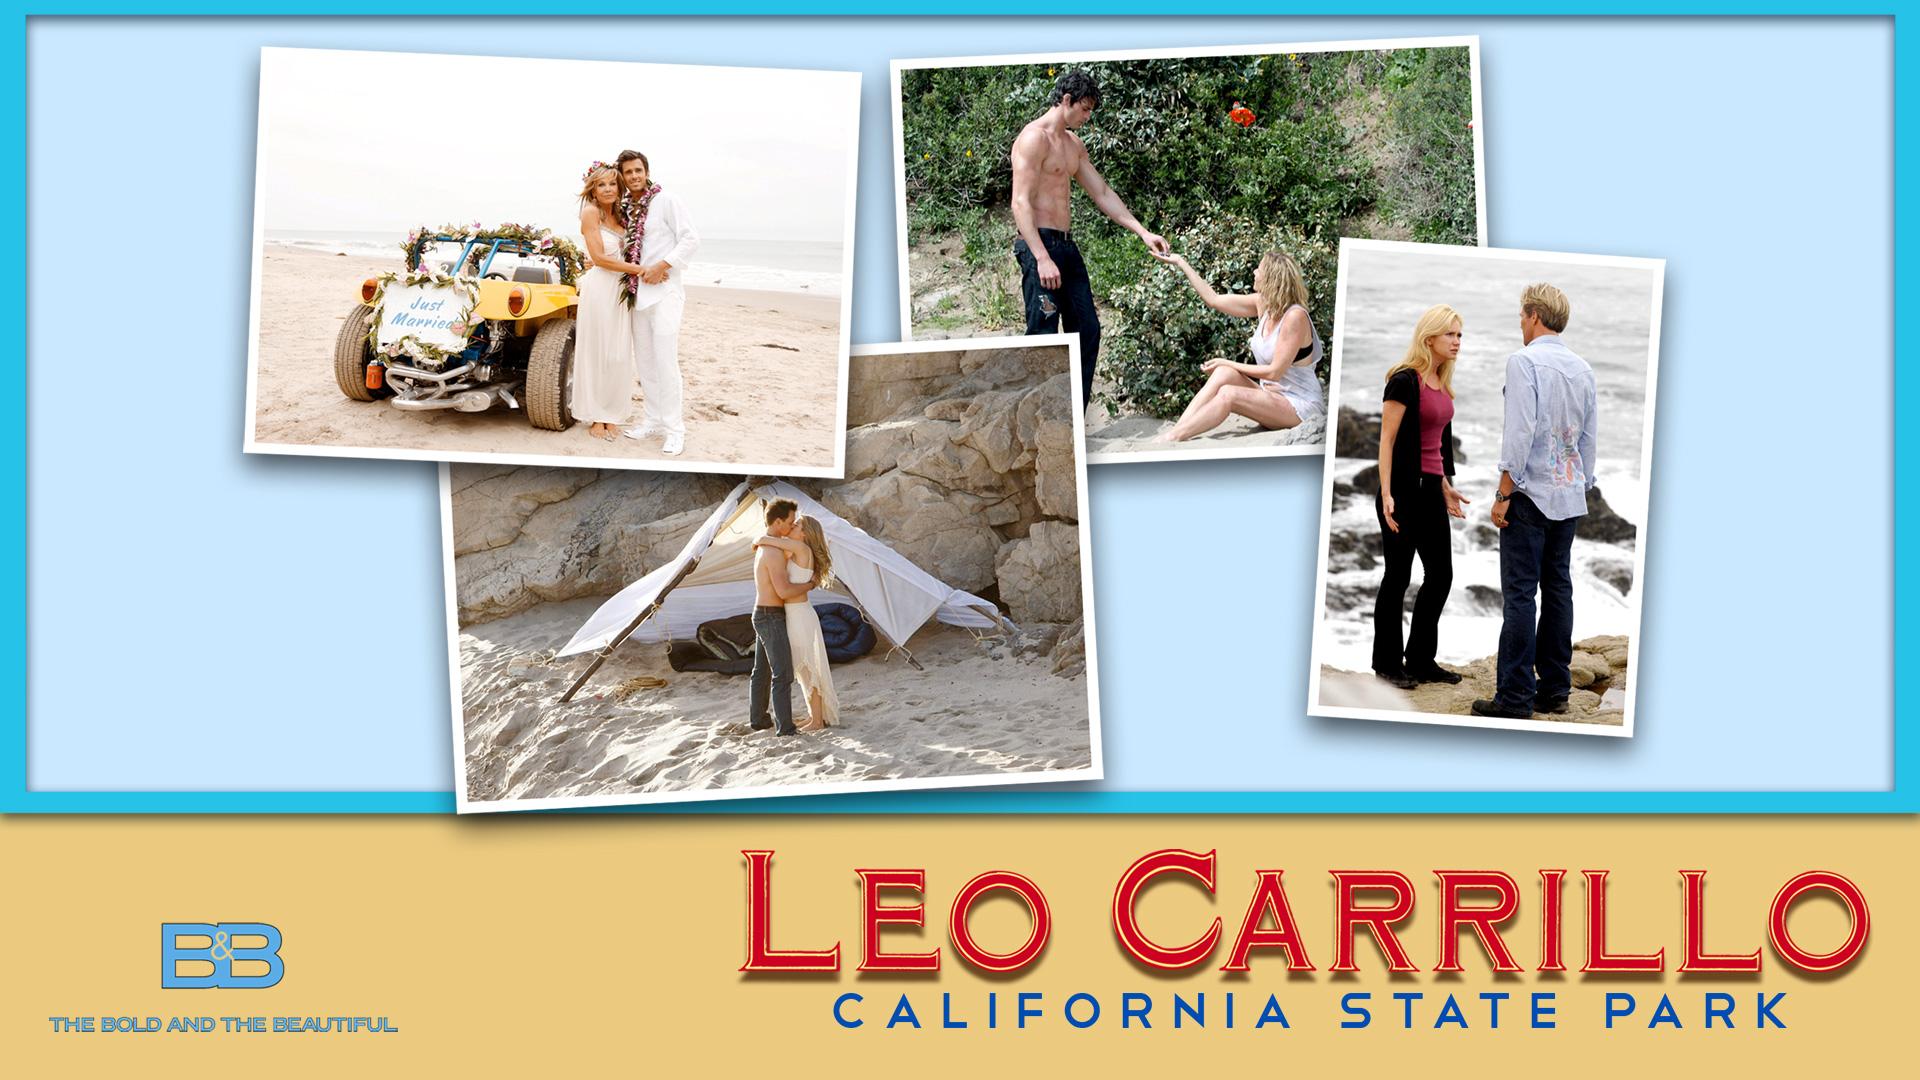 Leo Carrillo California State Park